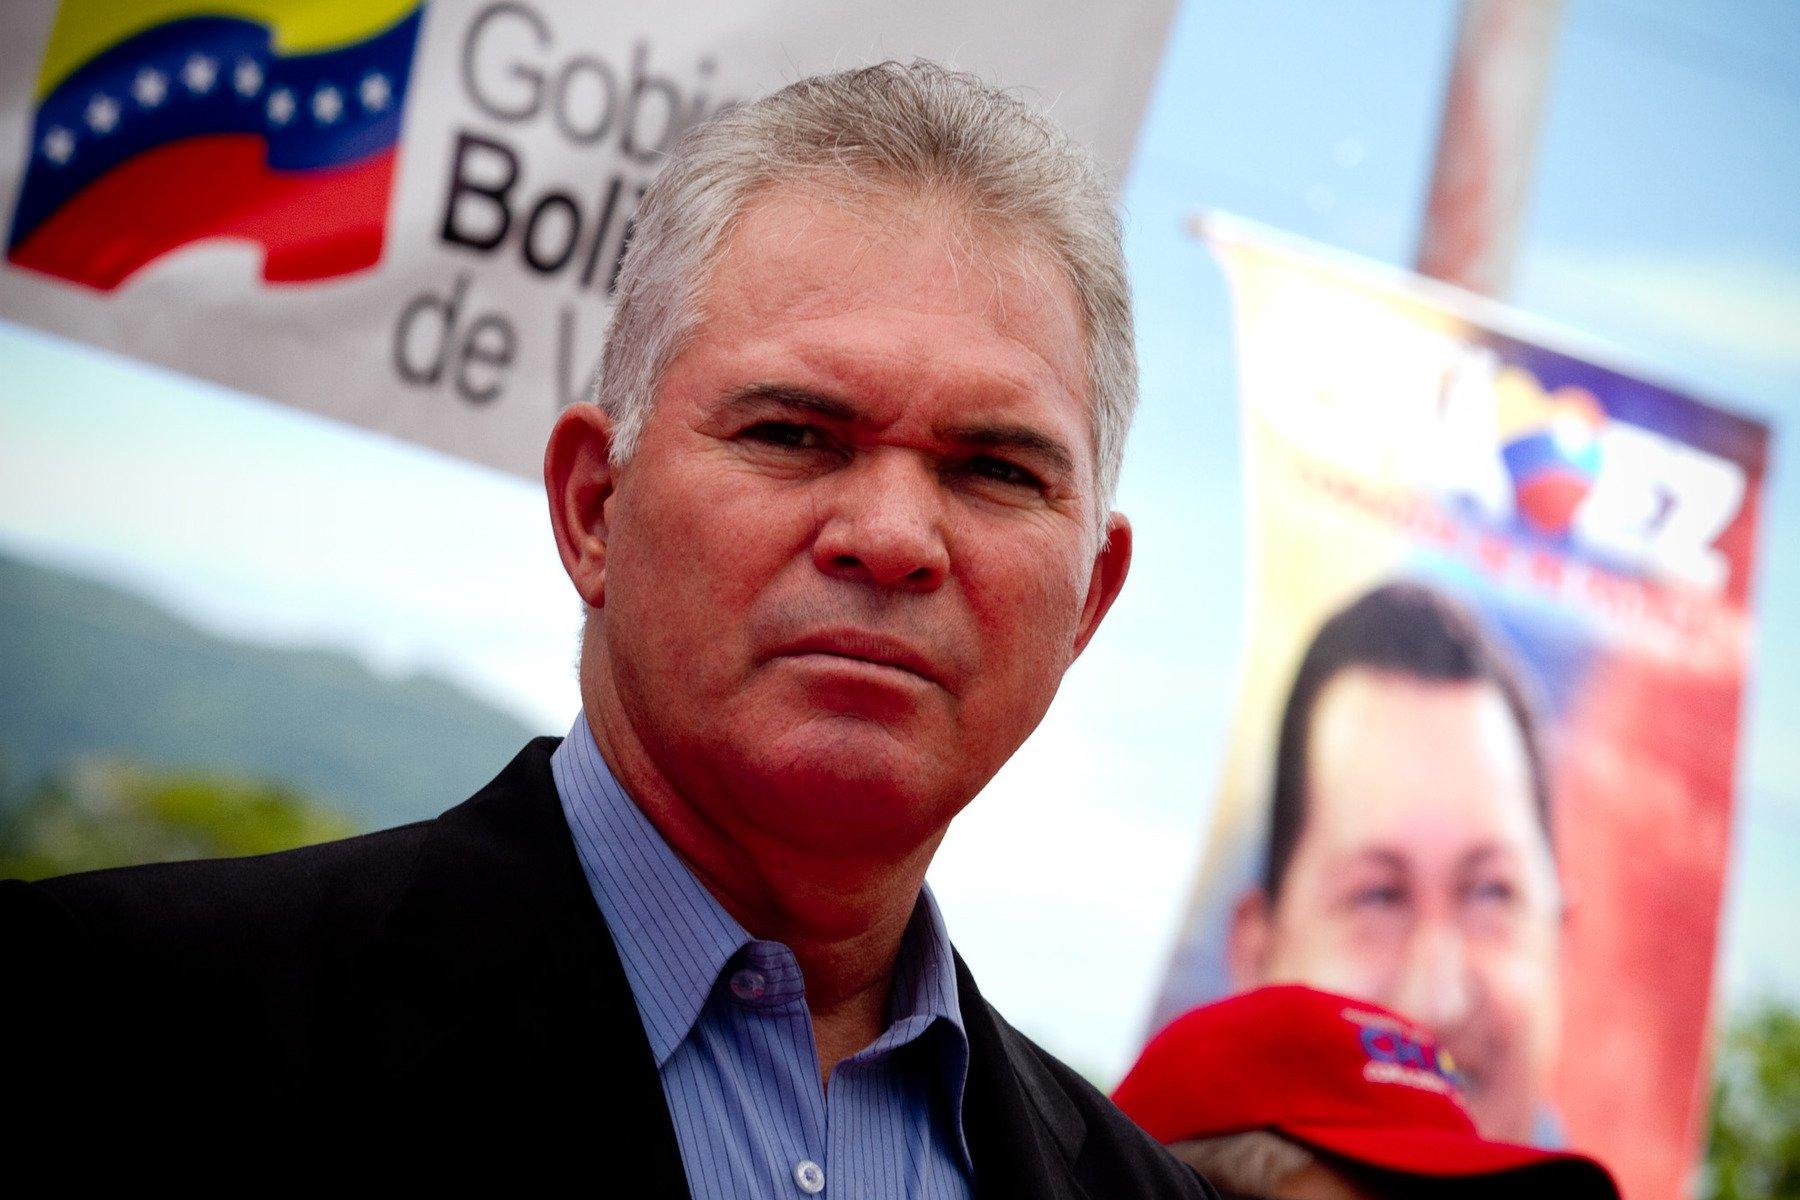 Carlos Mata Figueroa